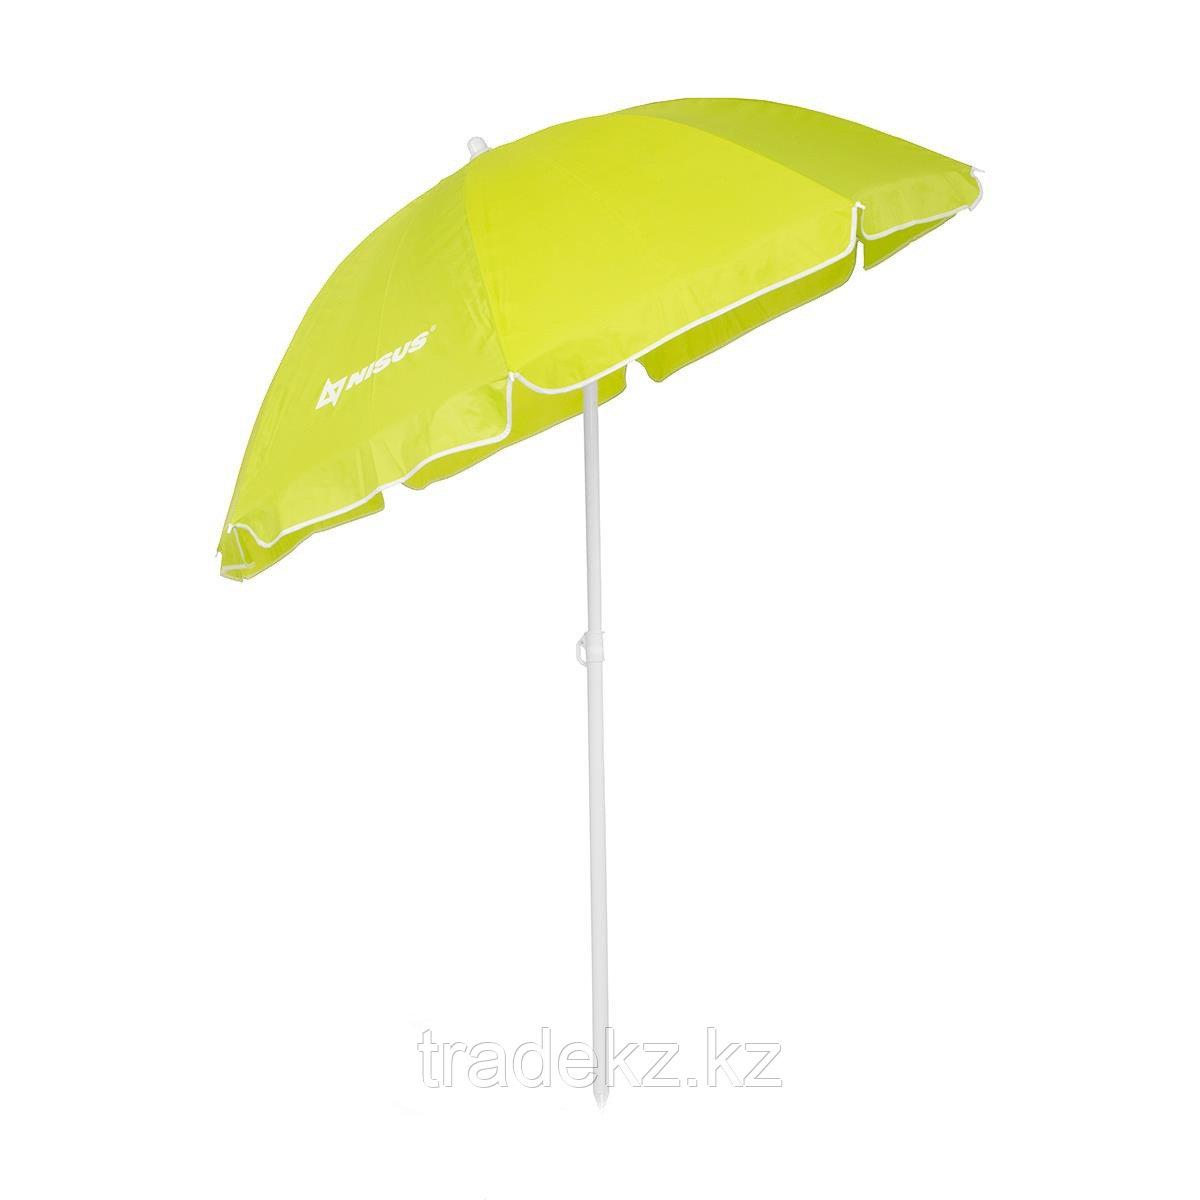 Зонт пляжный ТОНАР NISUS N-240N с наклоном